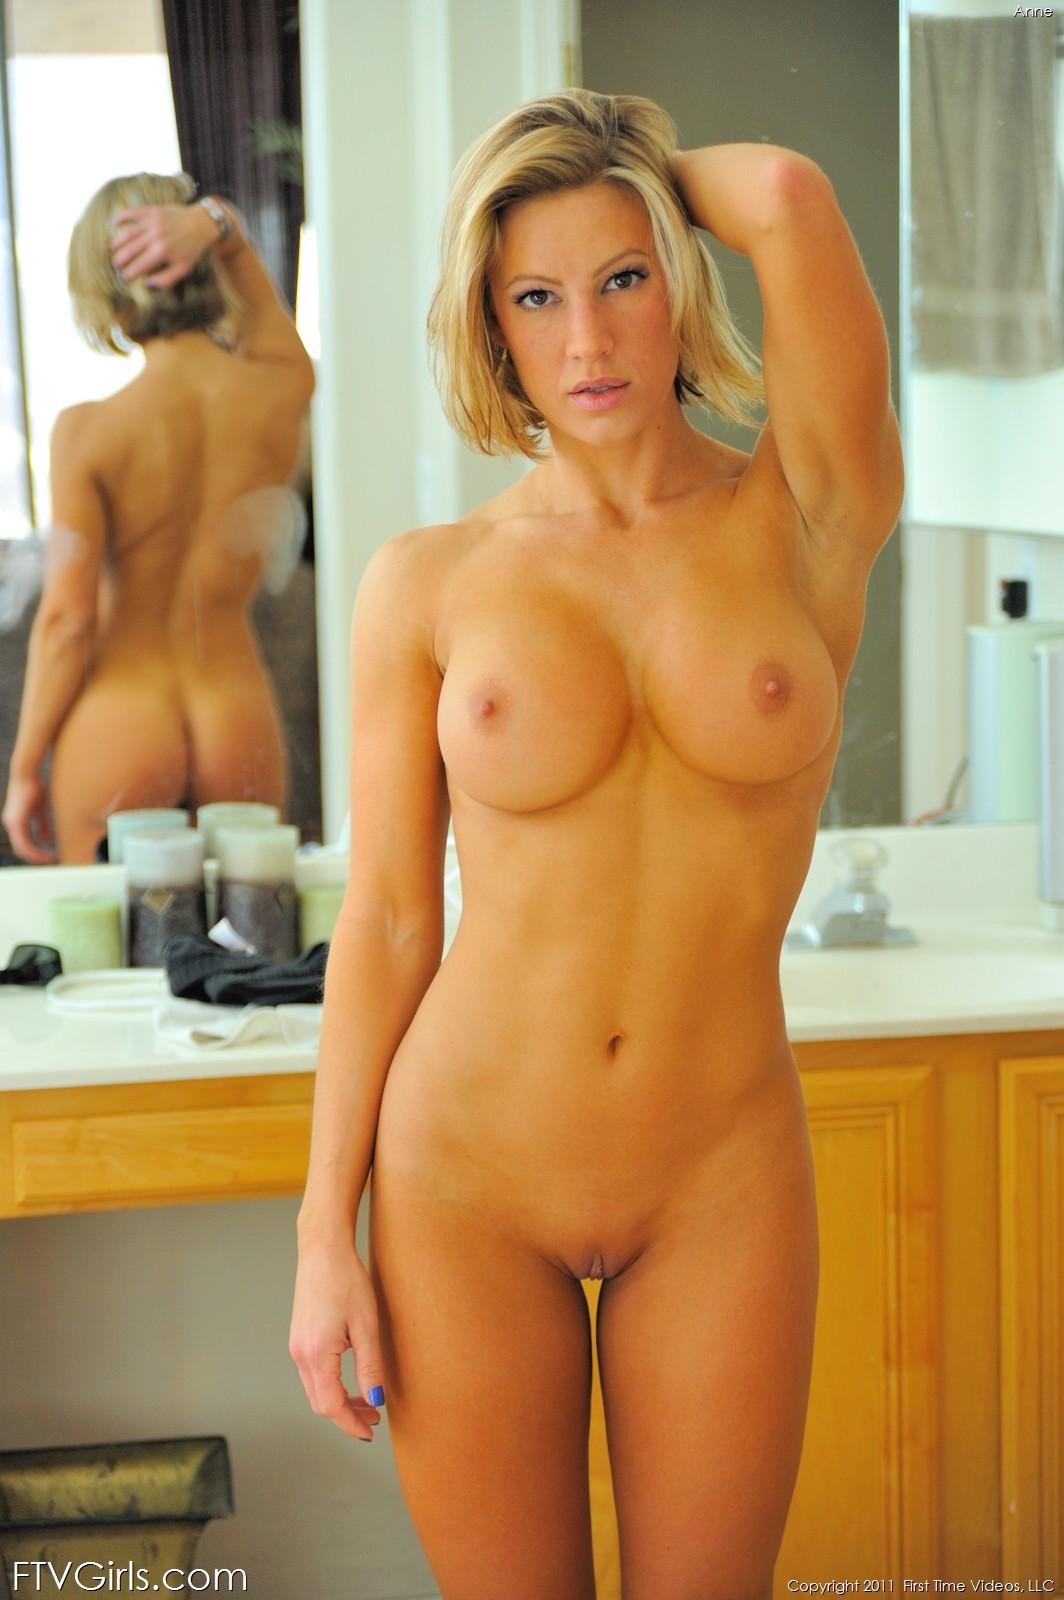 FTV Girls - Nude Athletic Amateur at AmateurIndex.com